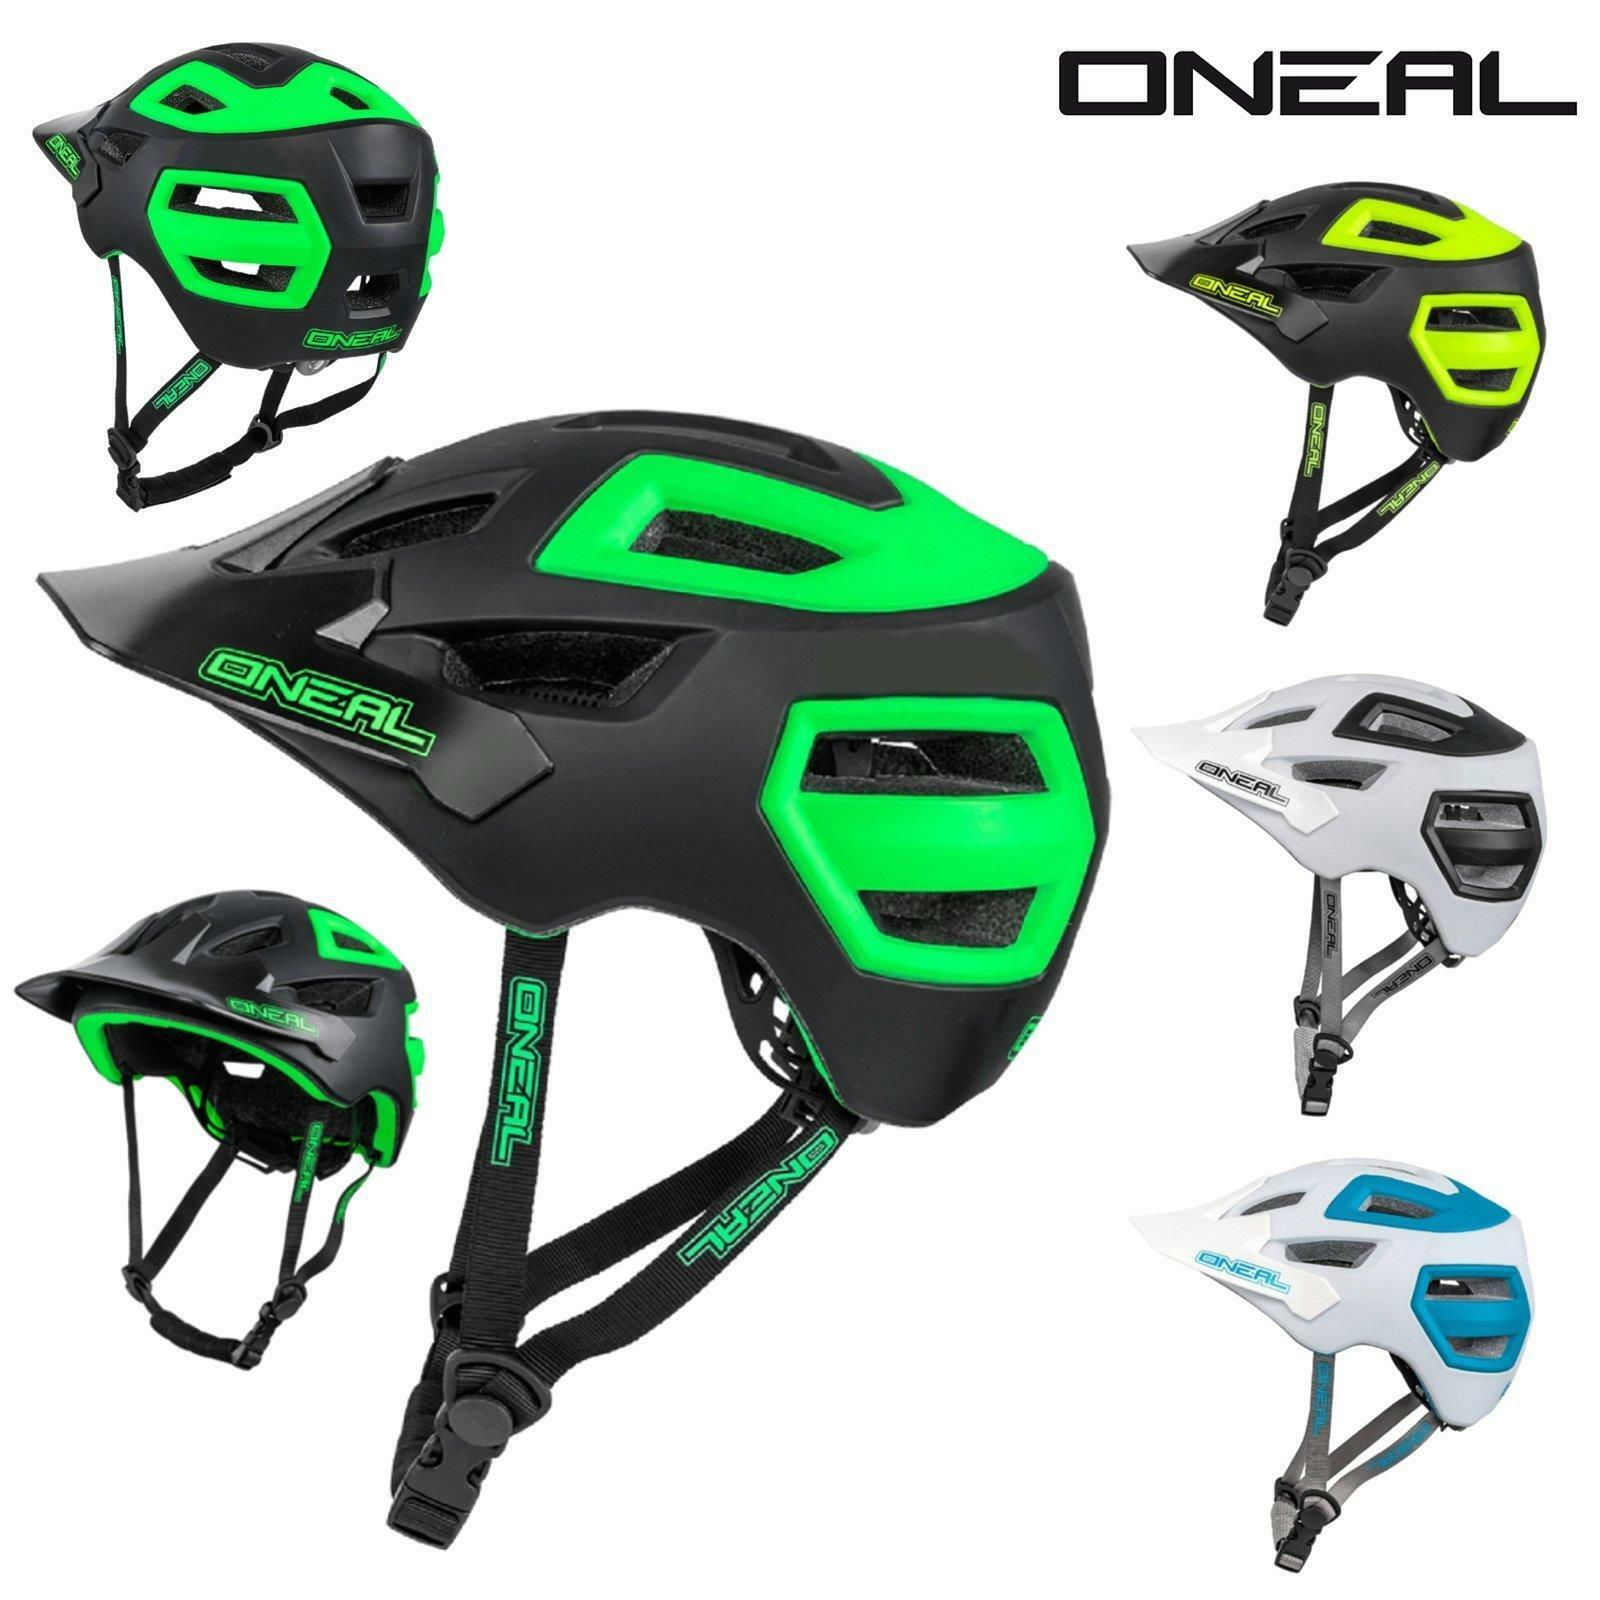 Casco de Enduro ONeal Pike todo trail FR MTB BMX en la bicicleta BTT todo EPS